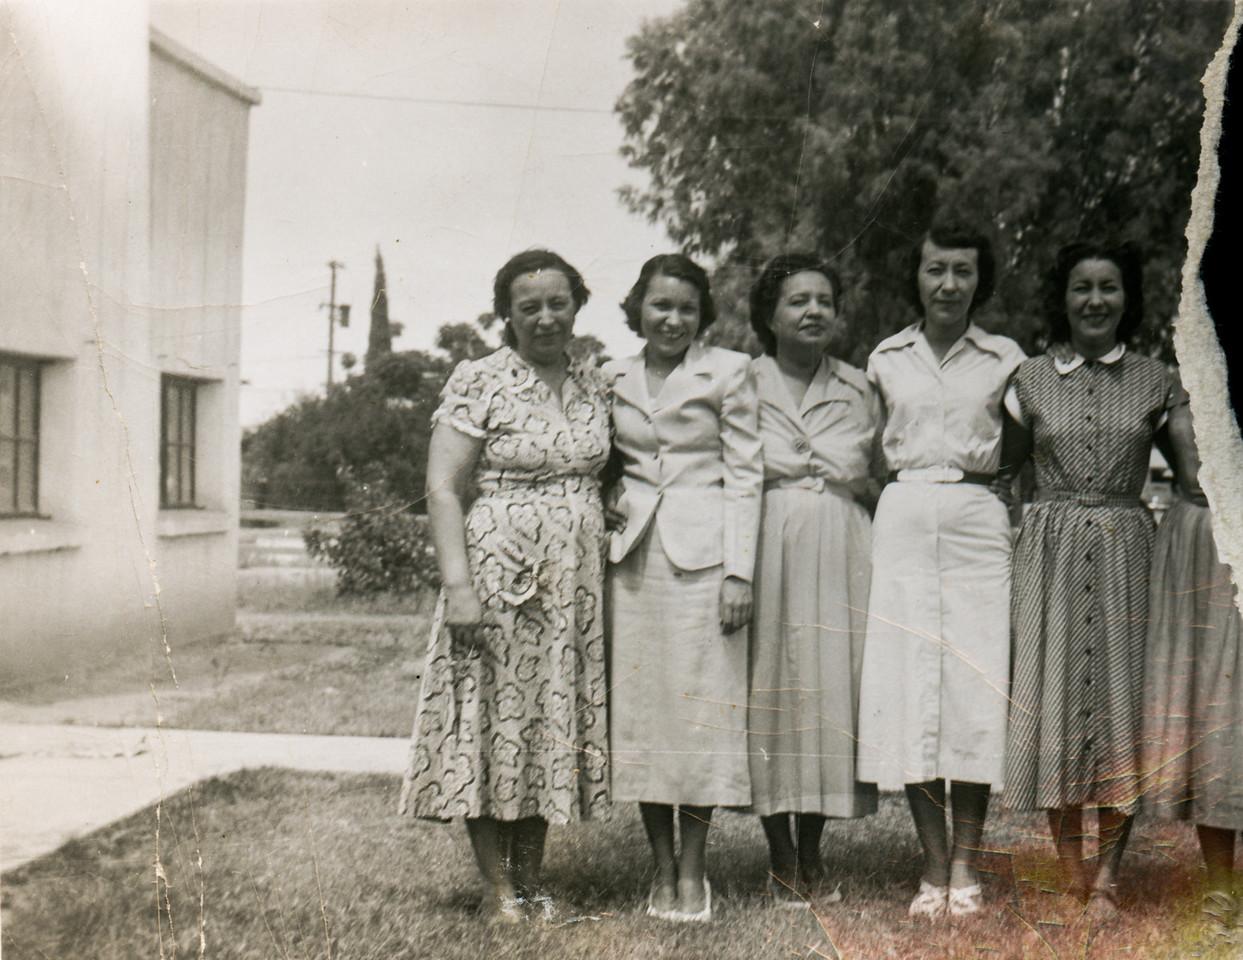 Sort ID: 1952-01 Image ID: M017.  Mary Ortega Gabusi, Teresa Ortega, Sara Ortega Delgado, Josephine Ortega May, Carmela Ortega Silvas. Taken in front of mamagrande's house in Florence, AZ.